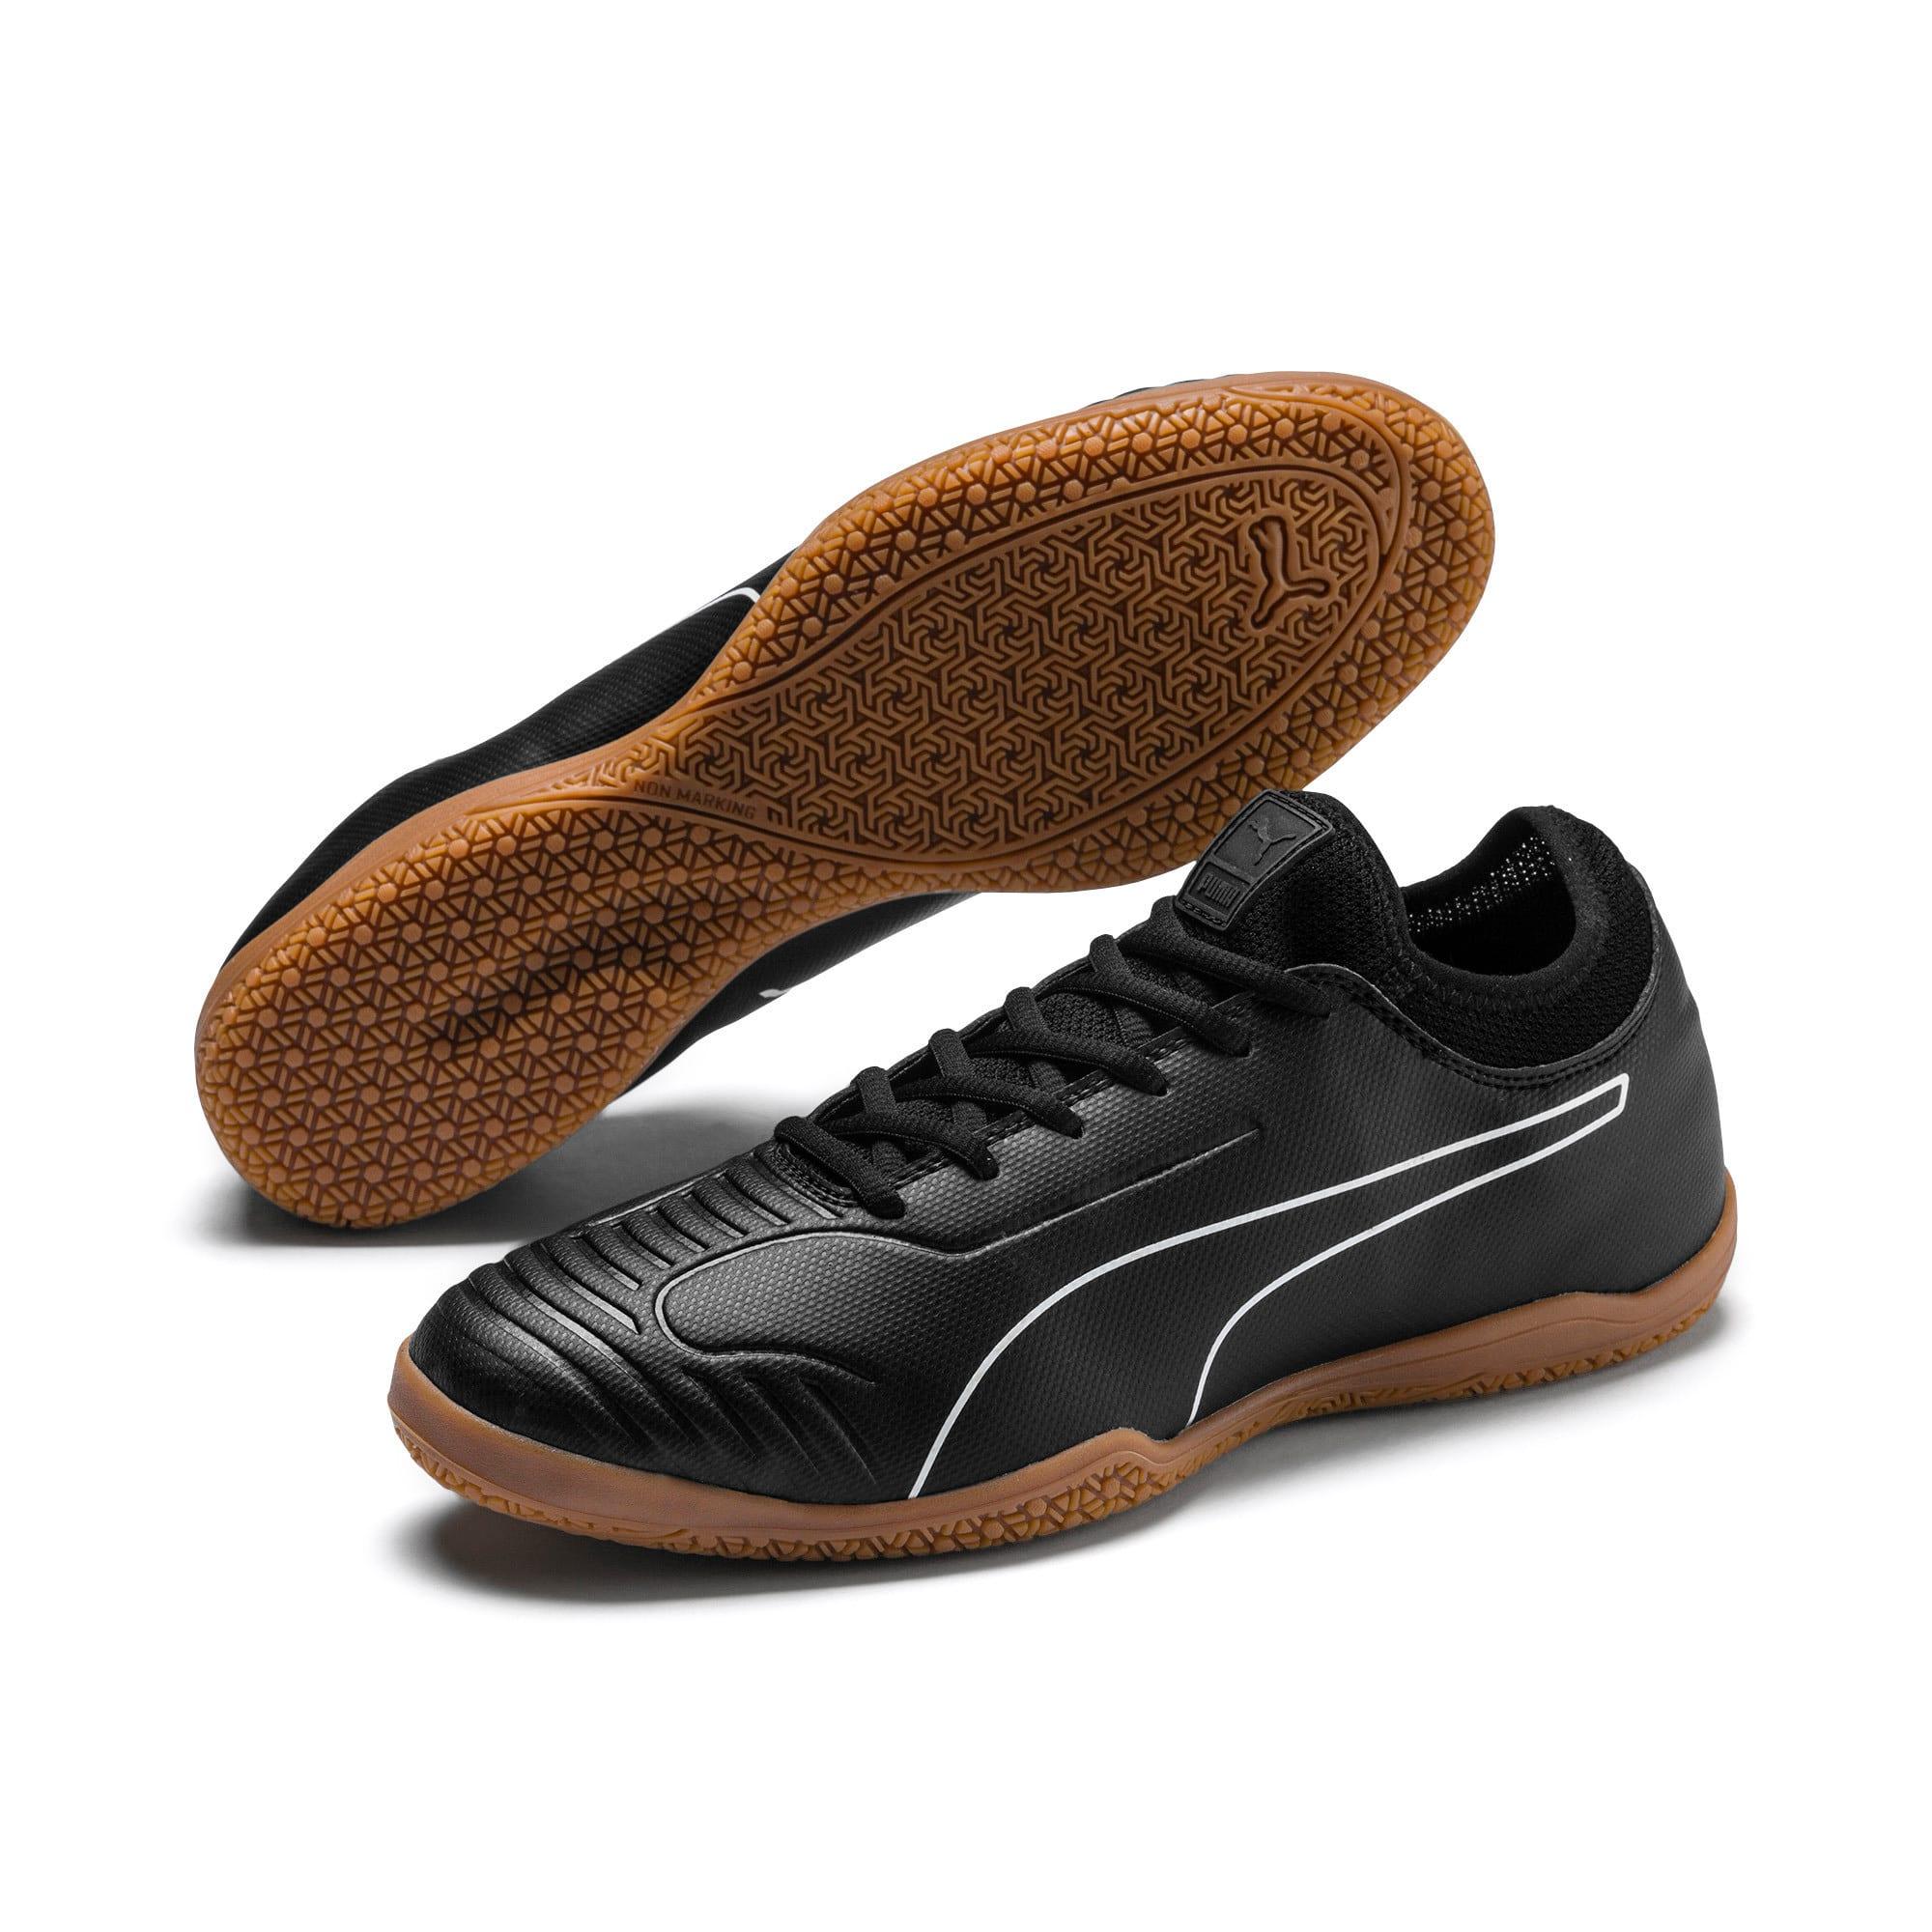 Thumbnail 3 of 365 Sala 2 Men's Football Boots, Puma Black-Puma White-Gum, medium